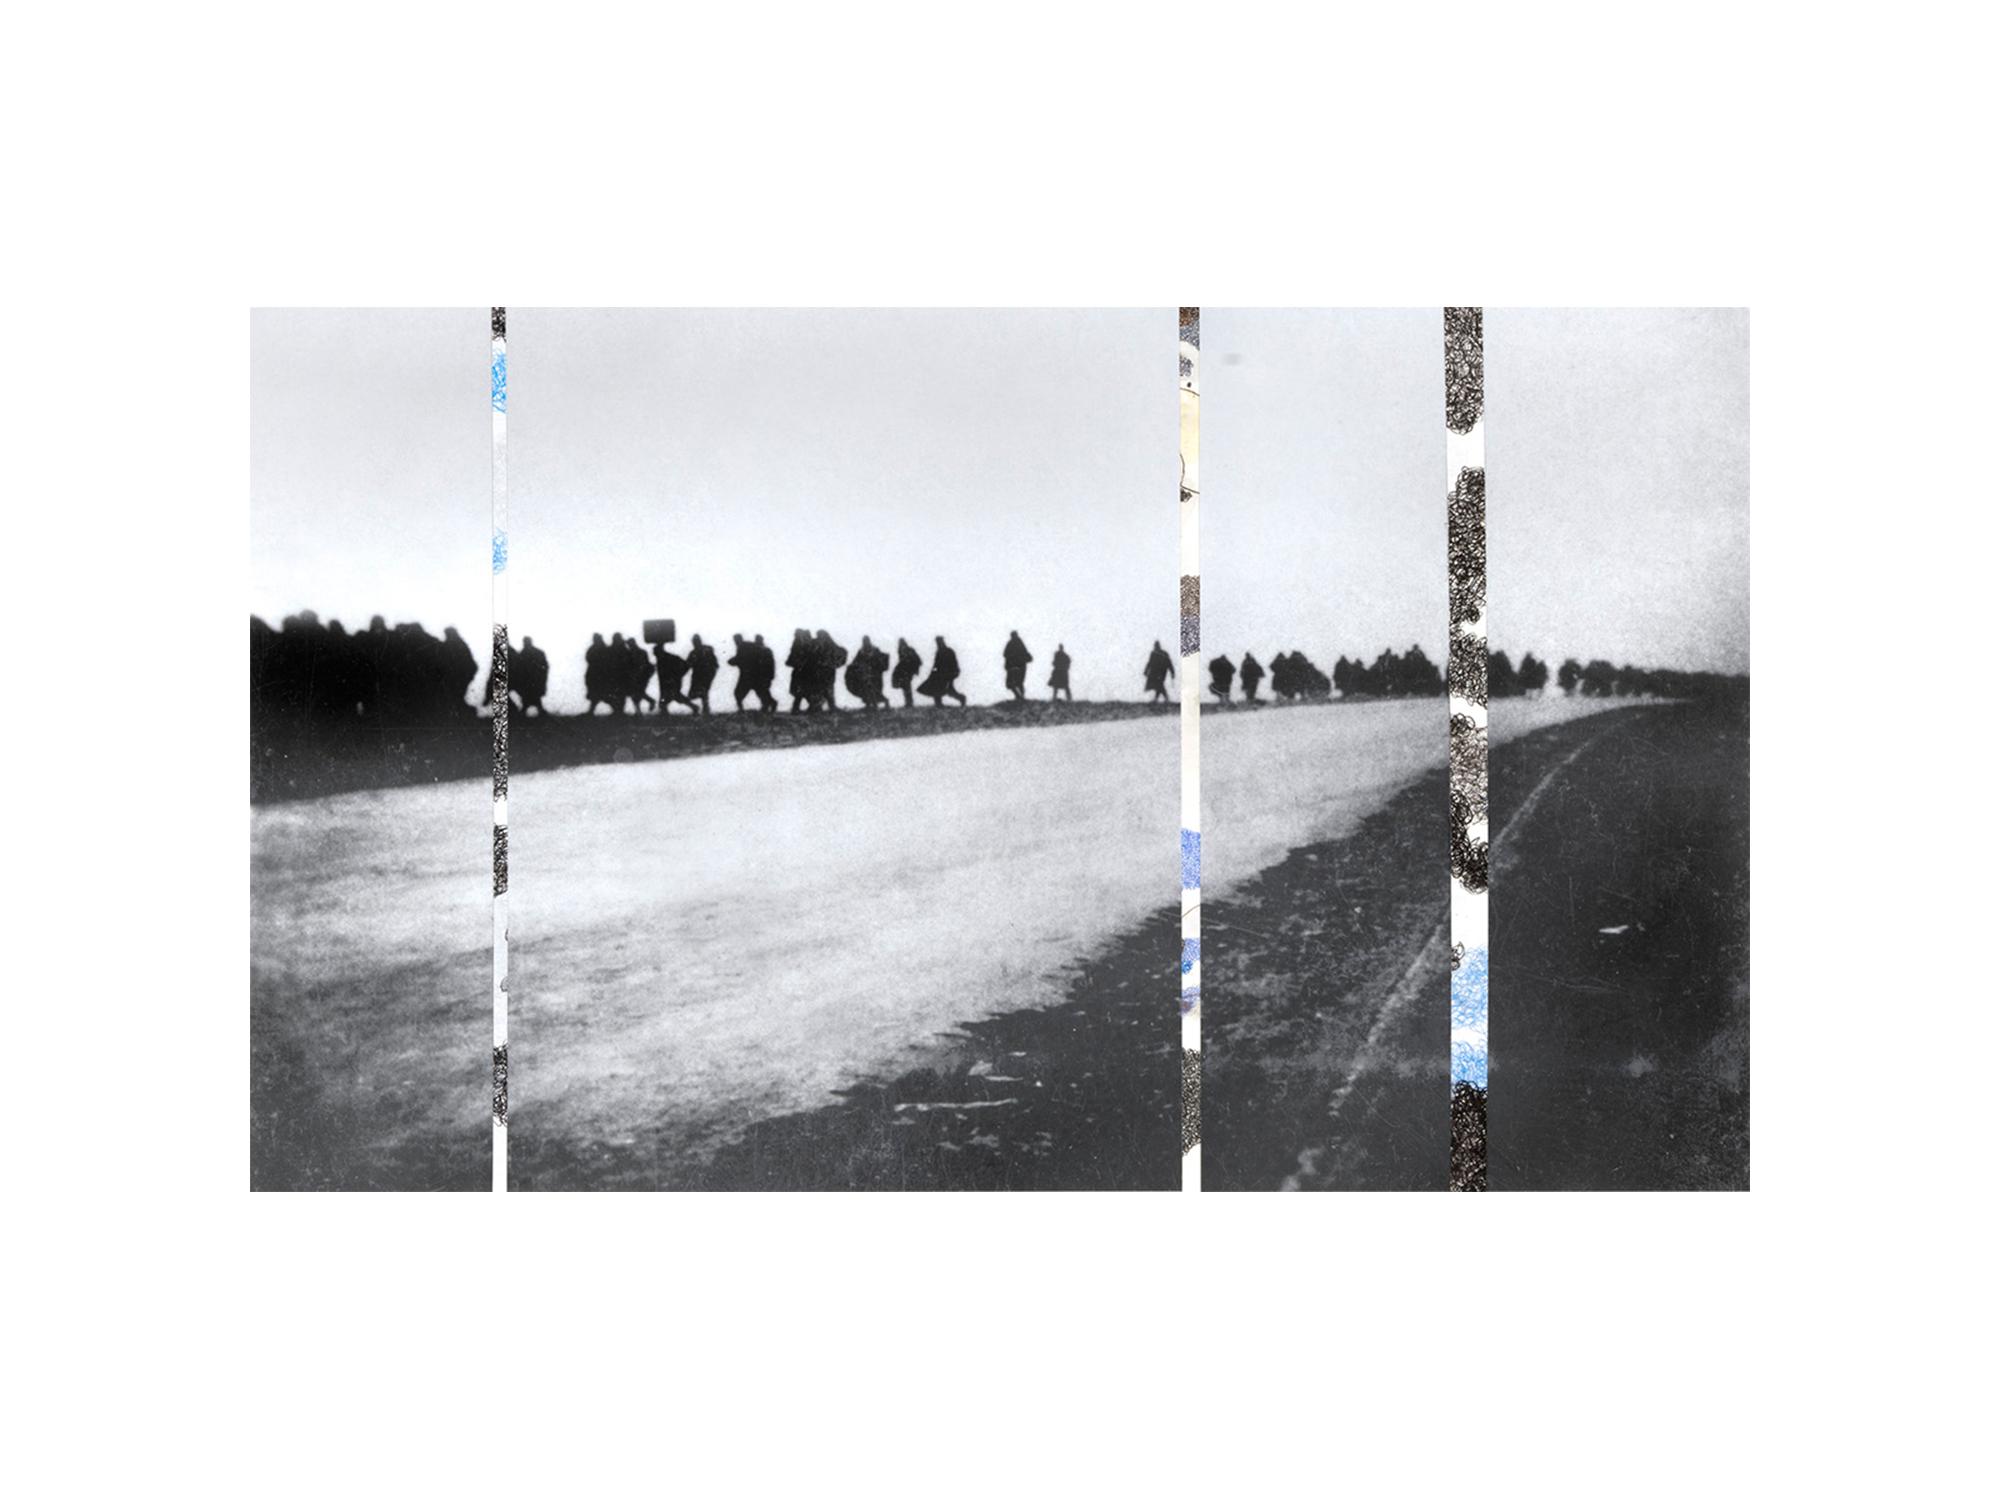 Denise Green   RJG: Italian P.O.W. Long Long Trail , 2016 one photograph and three drawings 106 x 66.5cm   ARTIST BIO